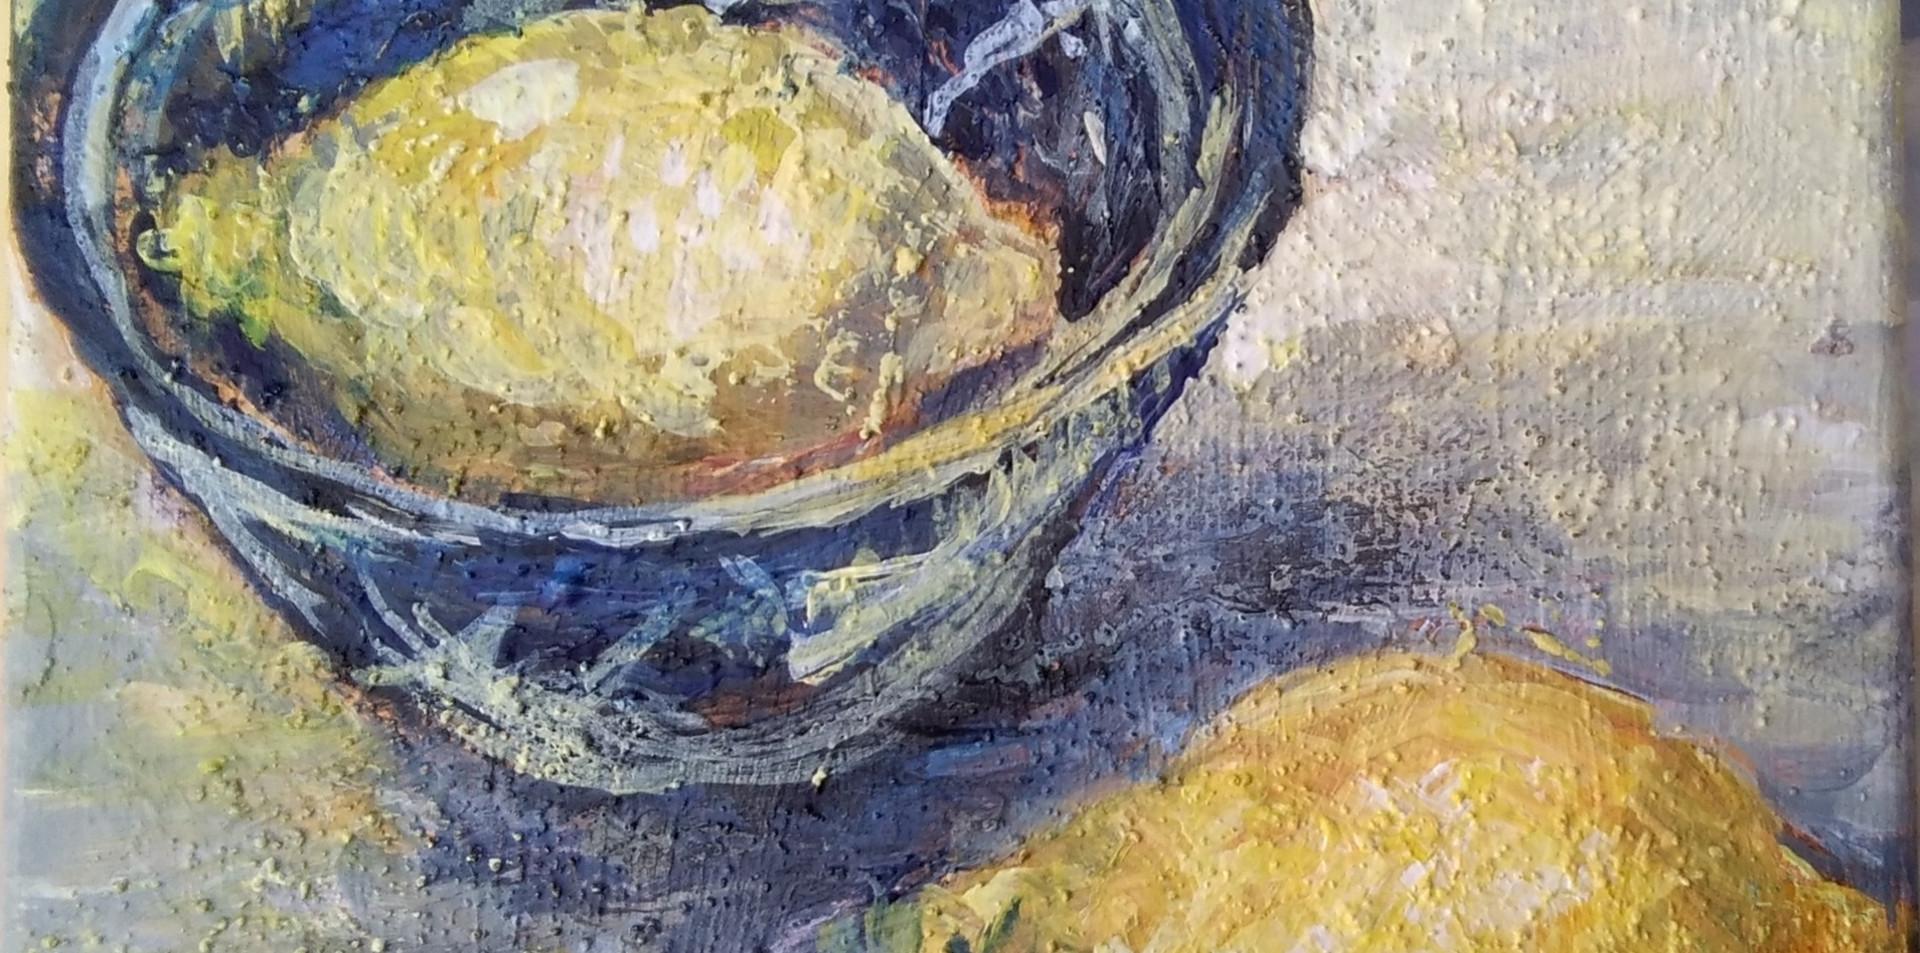 Lemons And Blue Bowl.